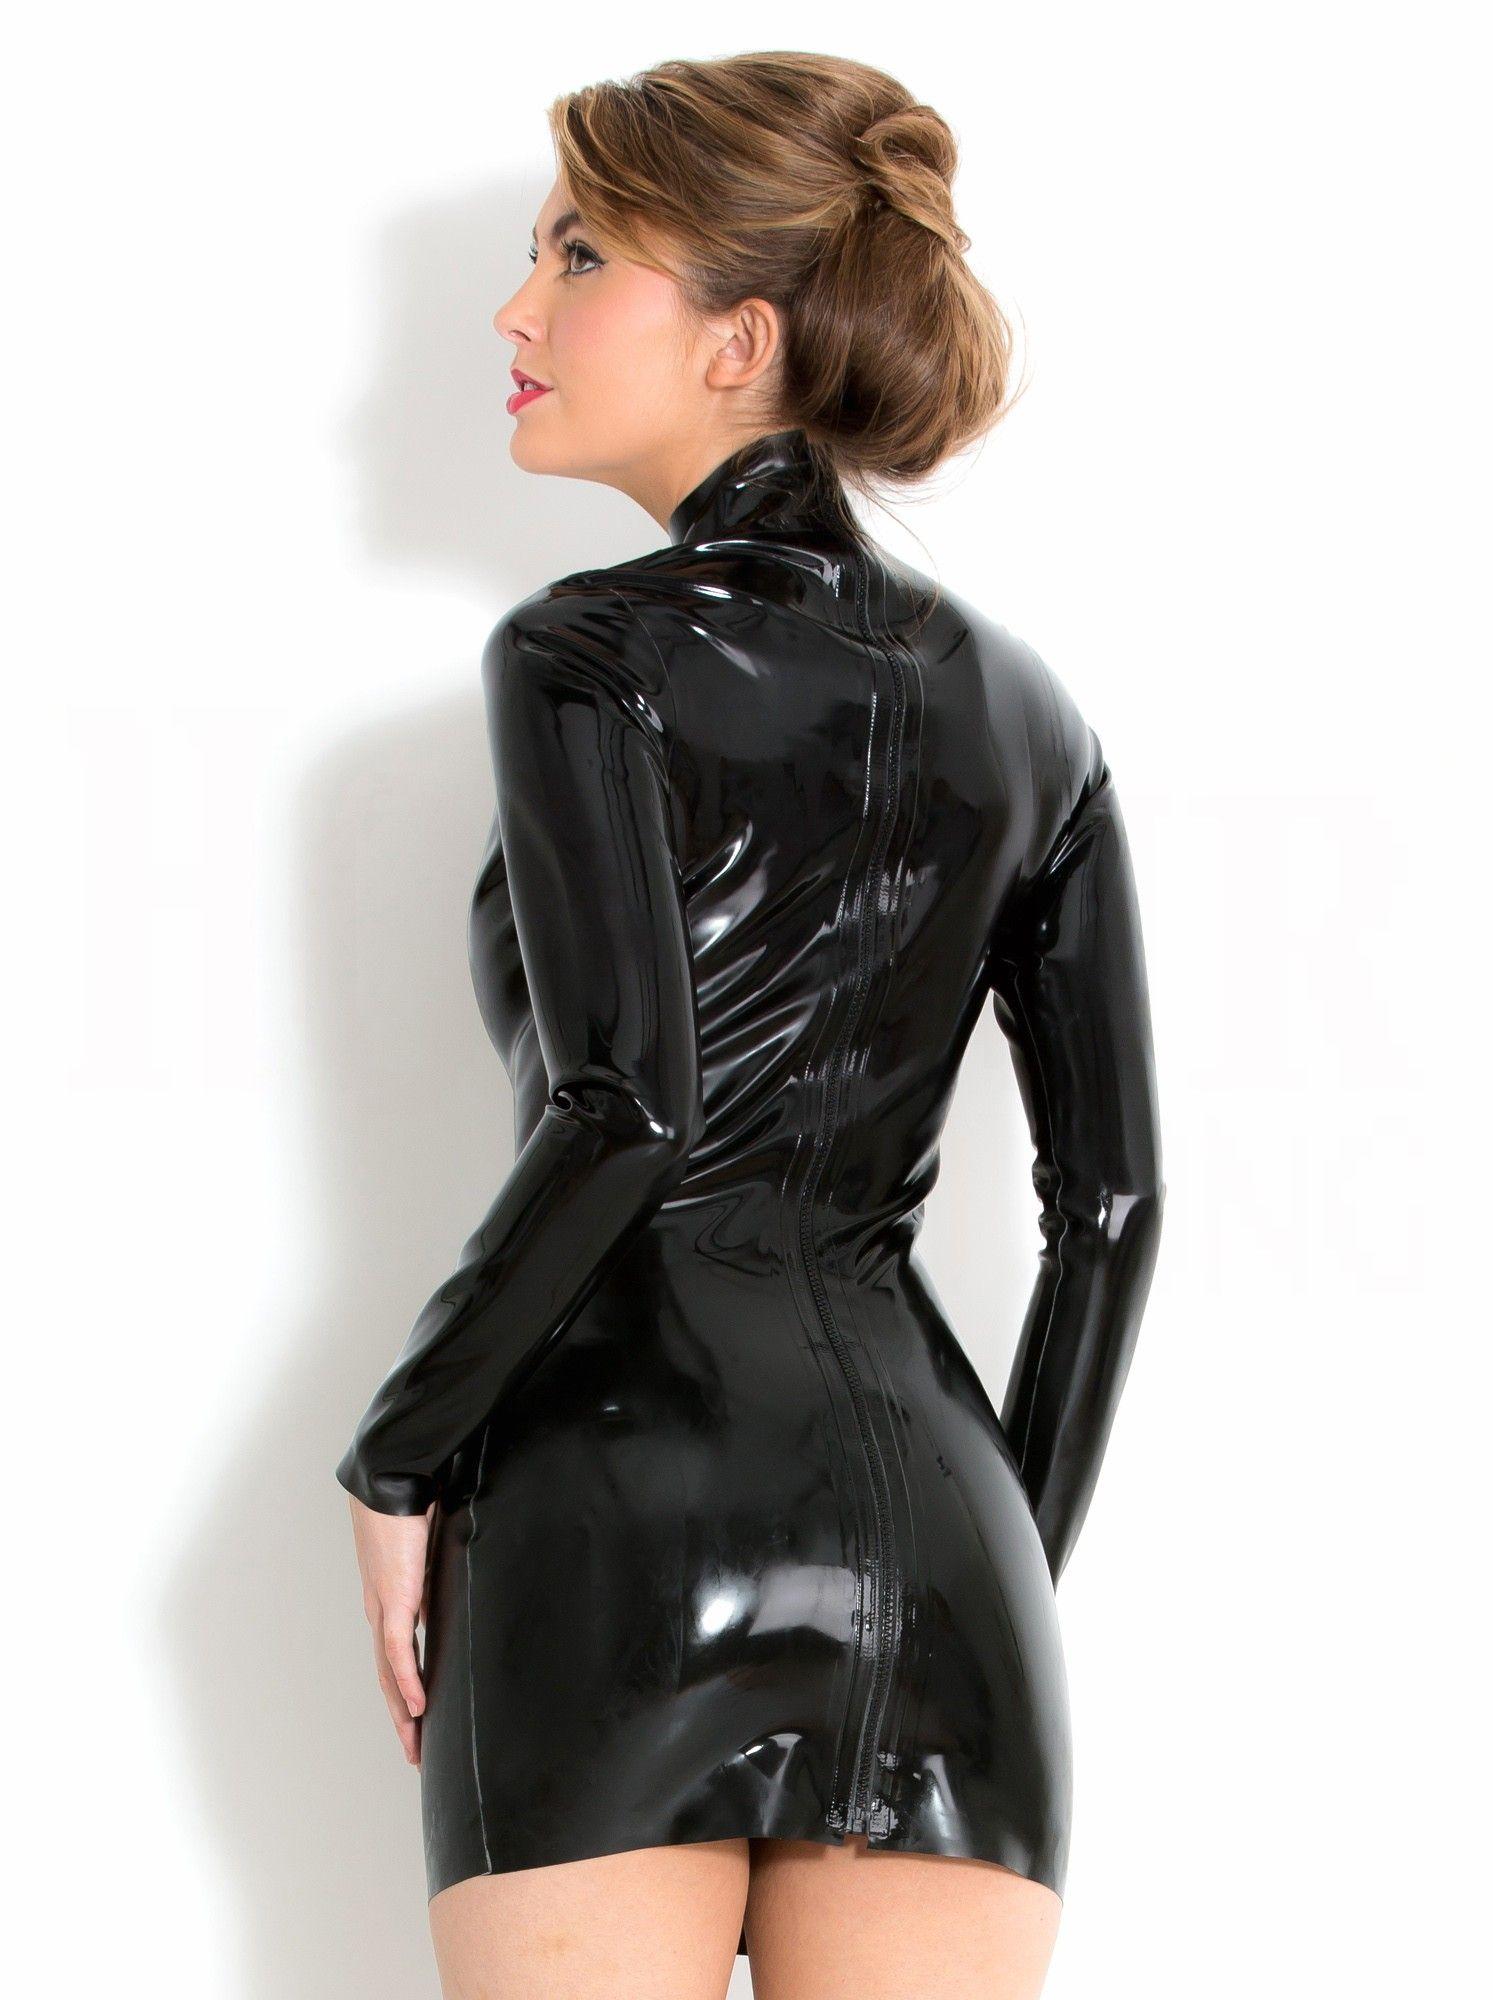 girl-fetish-clothing-pattern